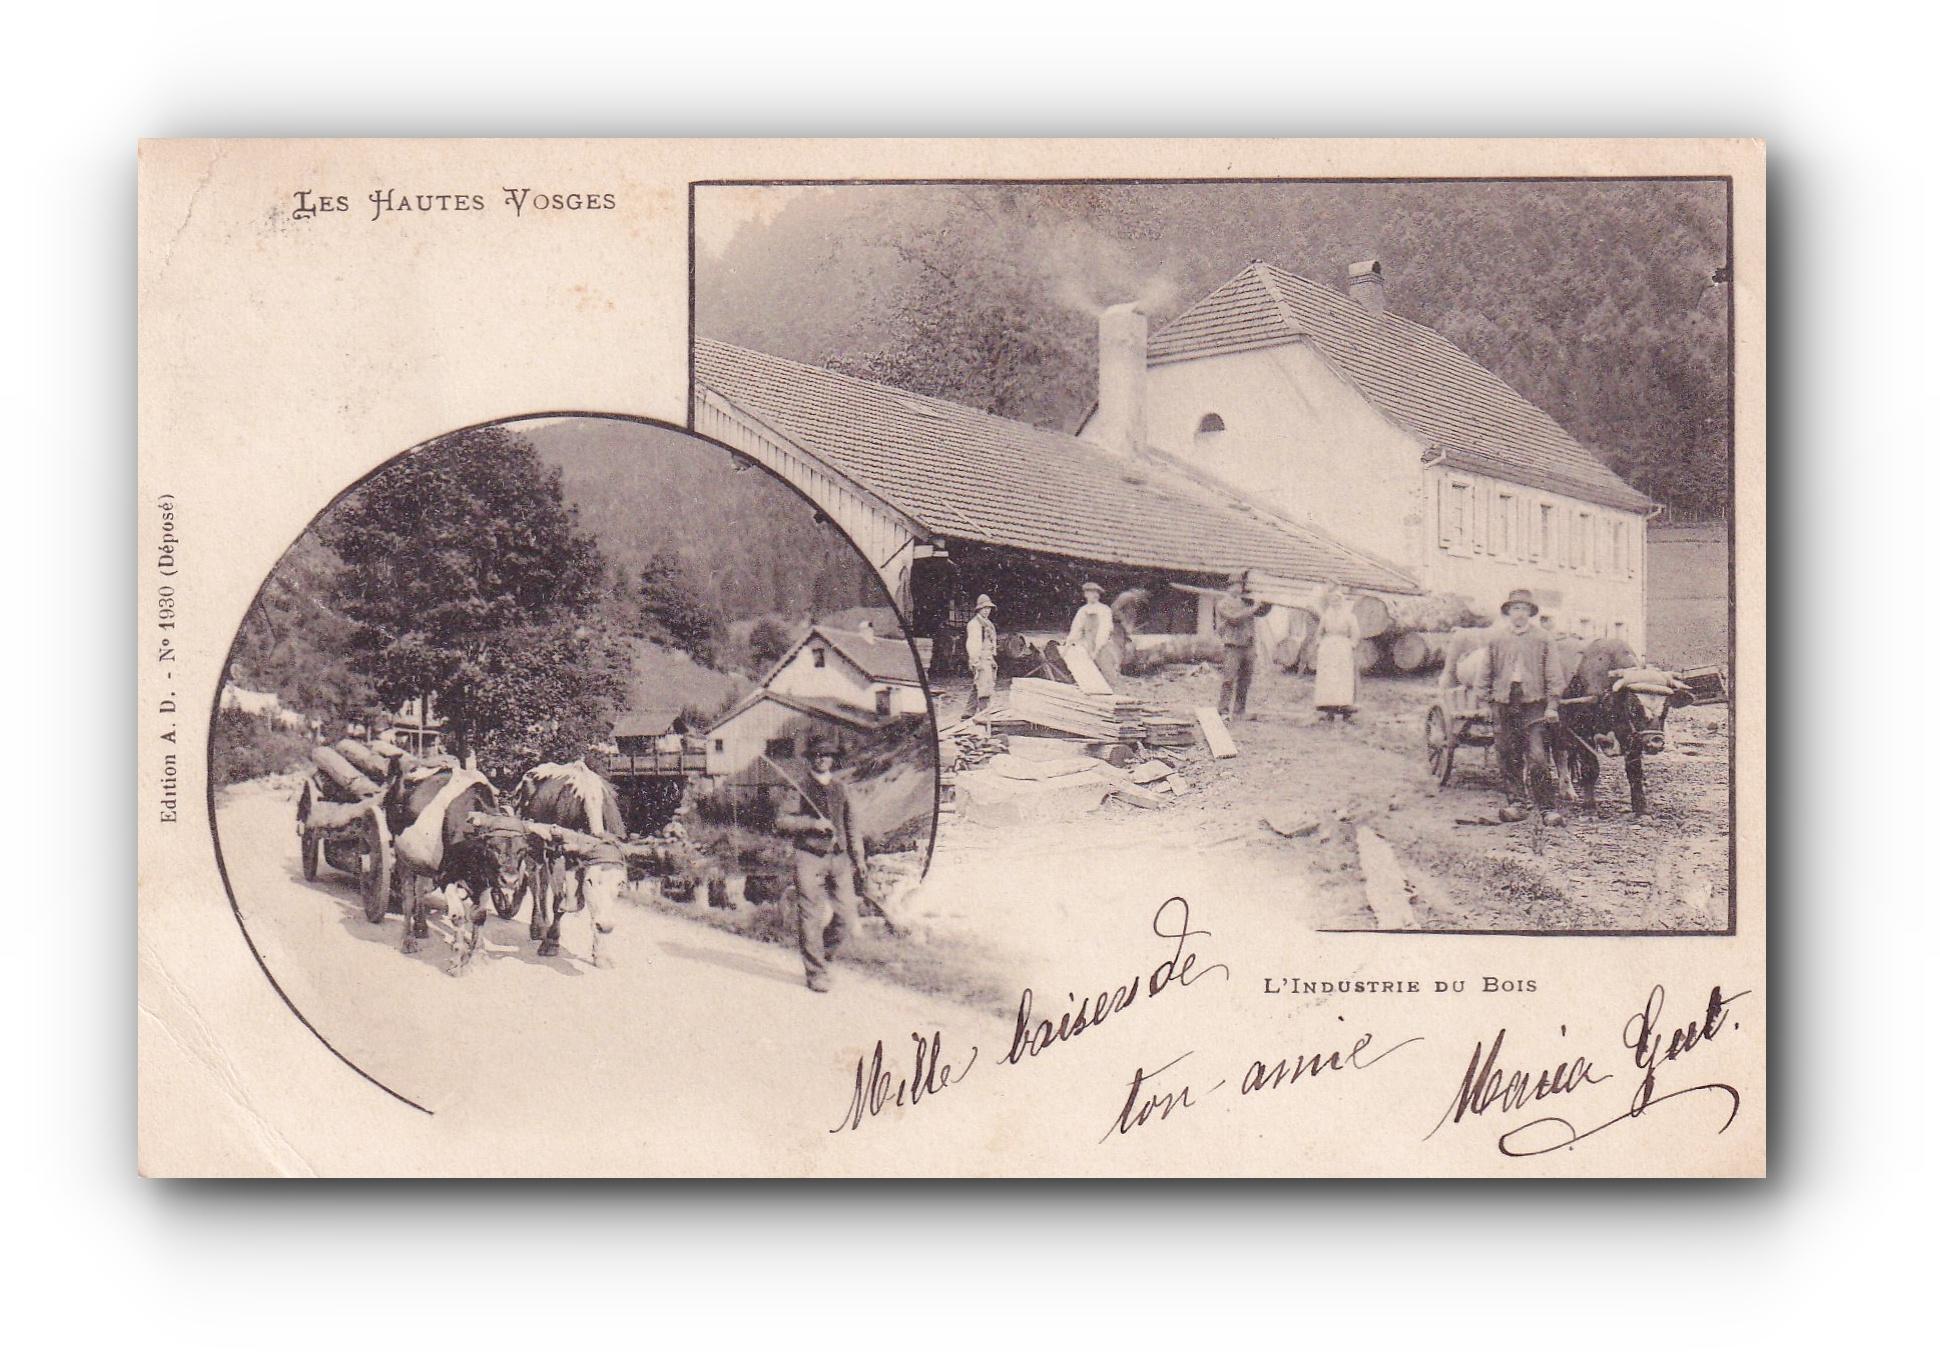 Les hautes Voges - 17.05.1903 -  Die Hochvogesen - The High Voges